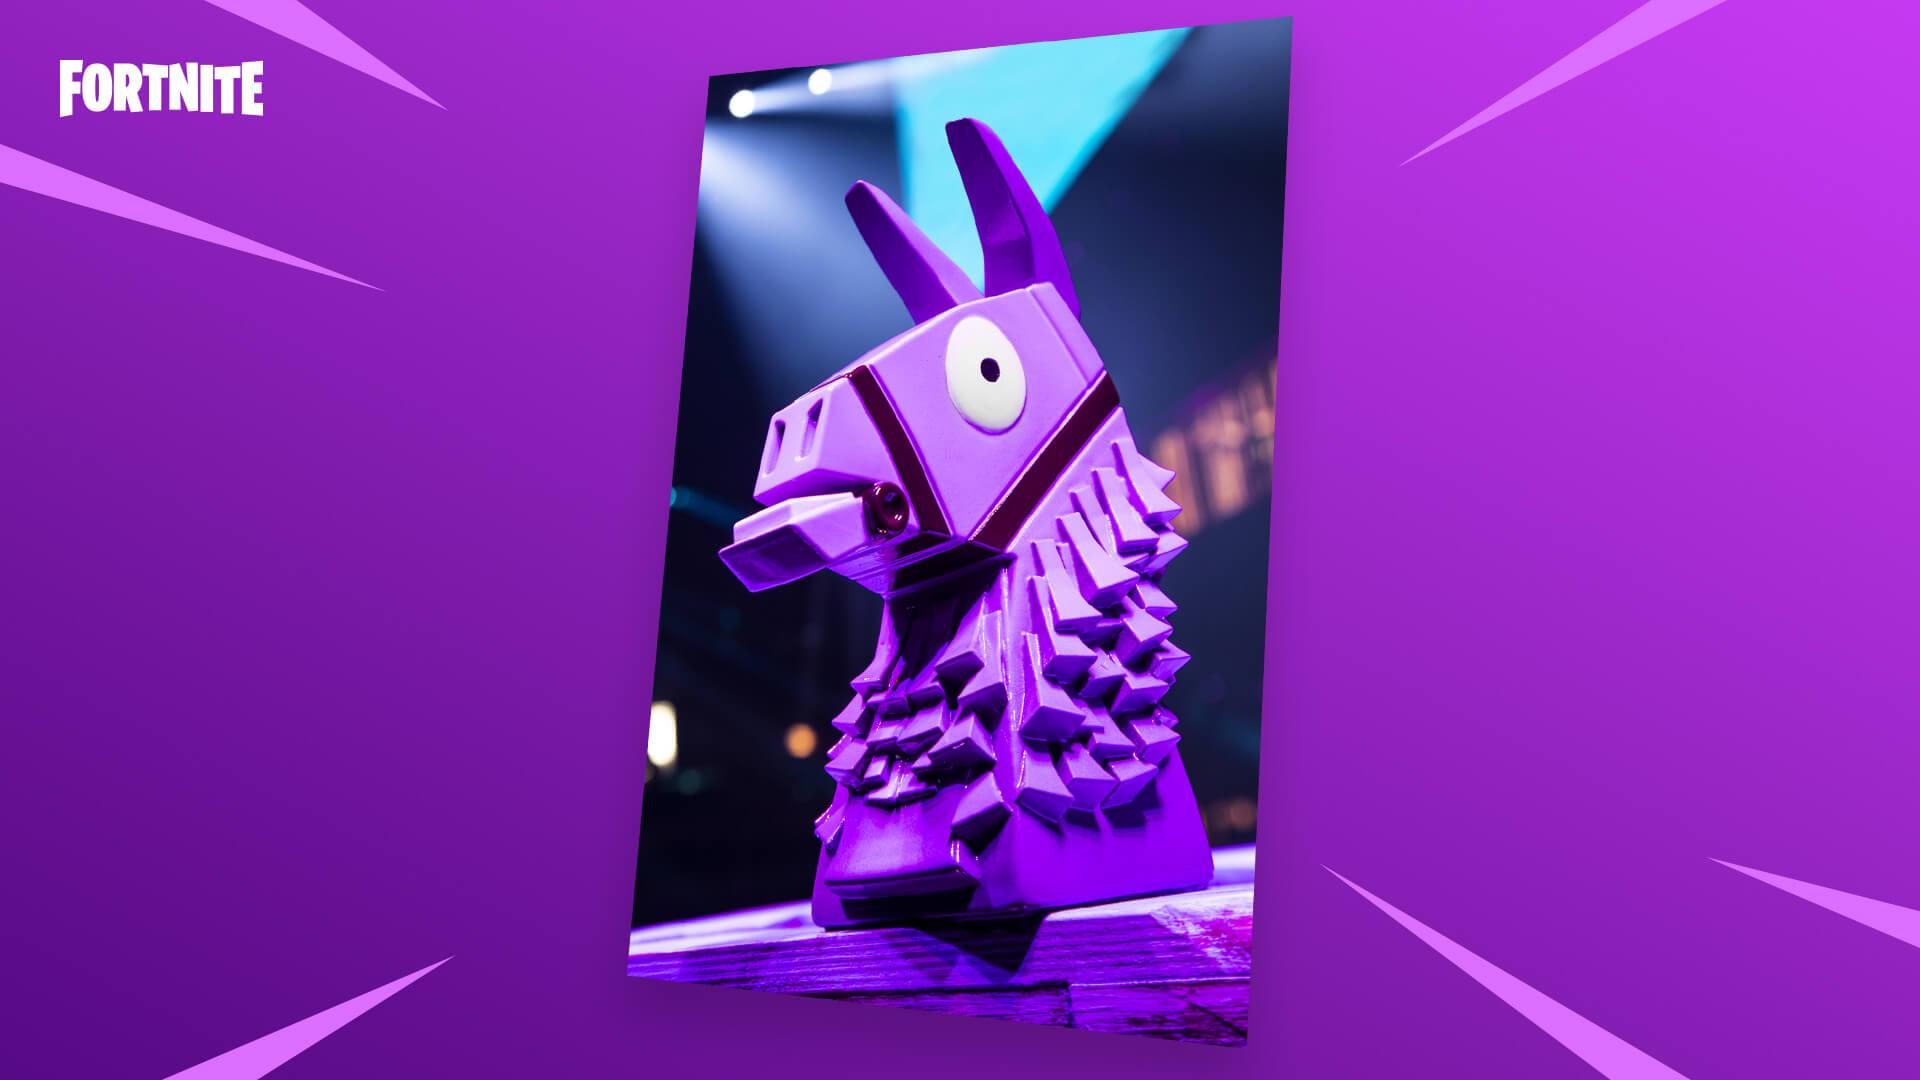 Fortnite Llama Trophy